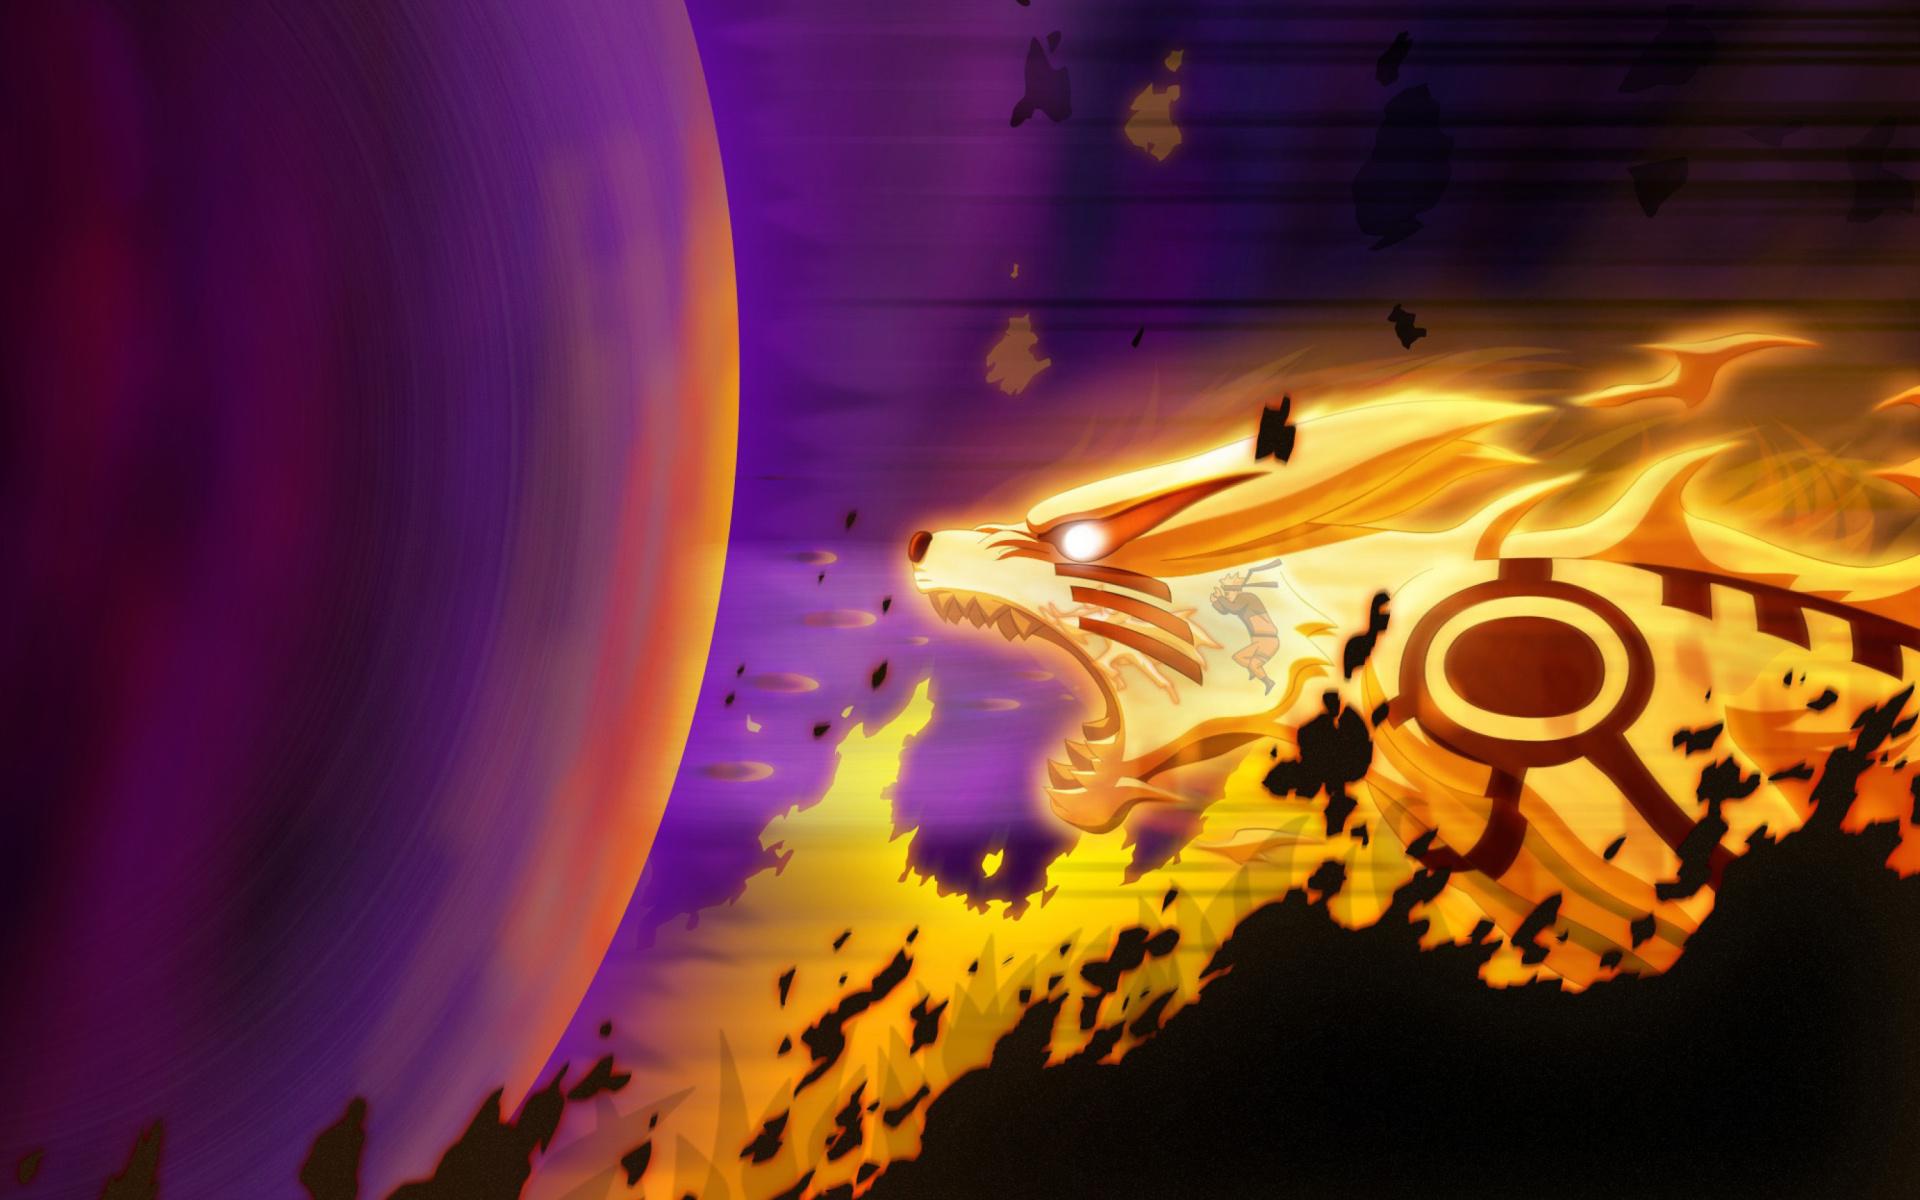 Cool Naruto Wallpapers HD Free Wallpaper Download 1920x1200